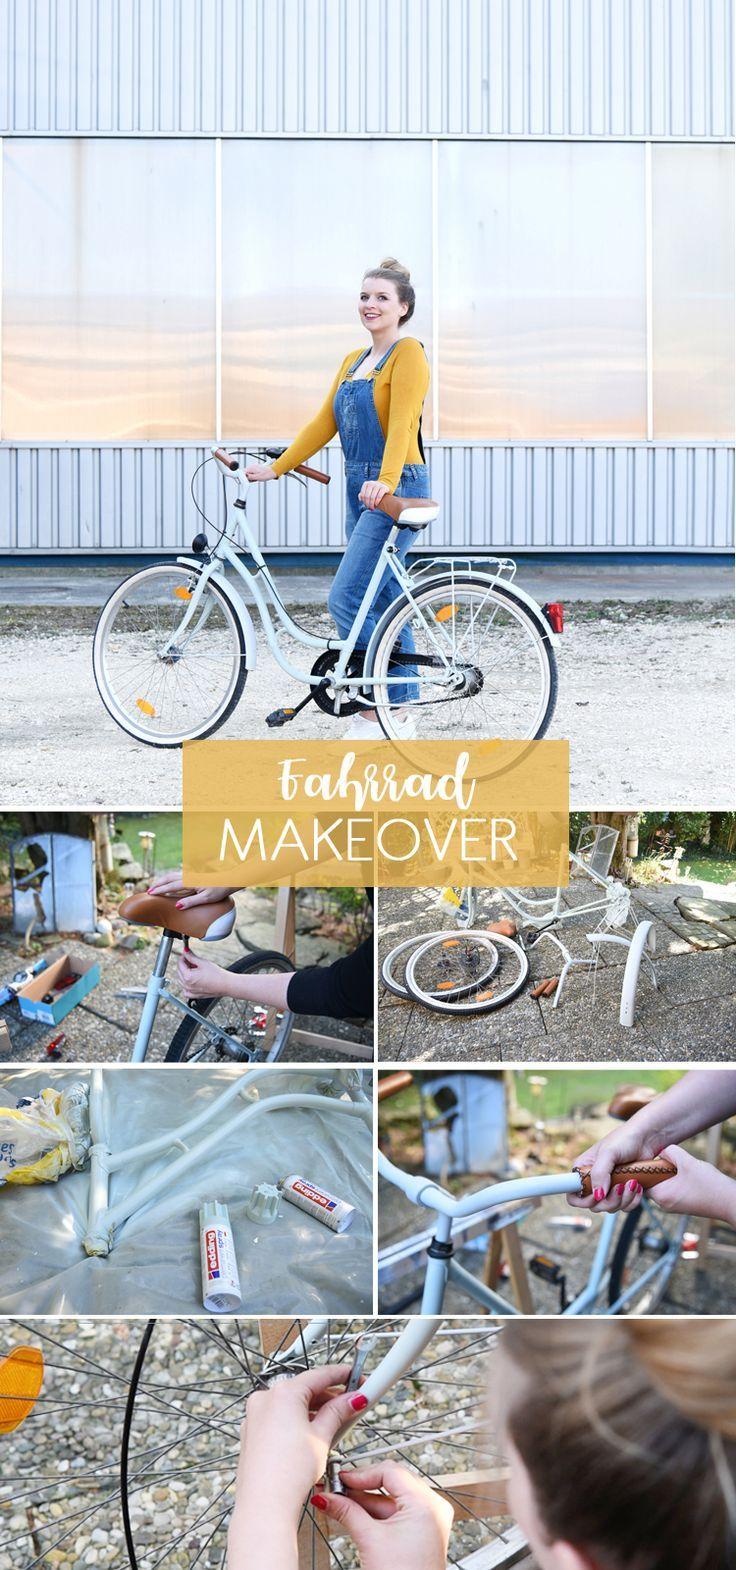 Altes Fahrrad neu lackieren: Mein Upcycling-Projekt